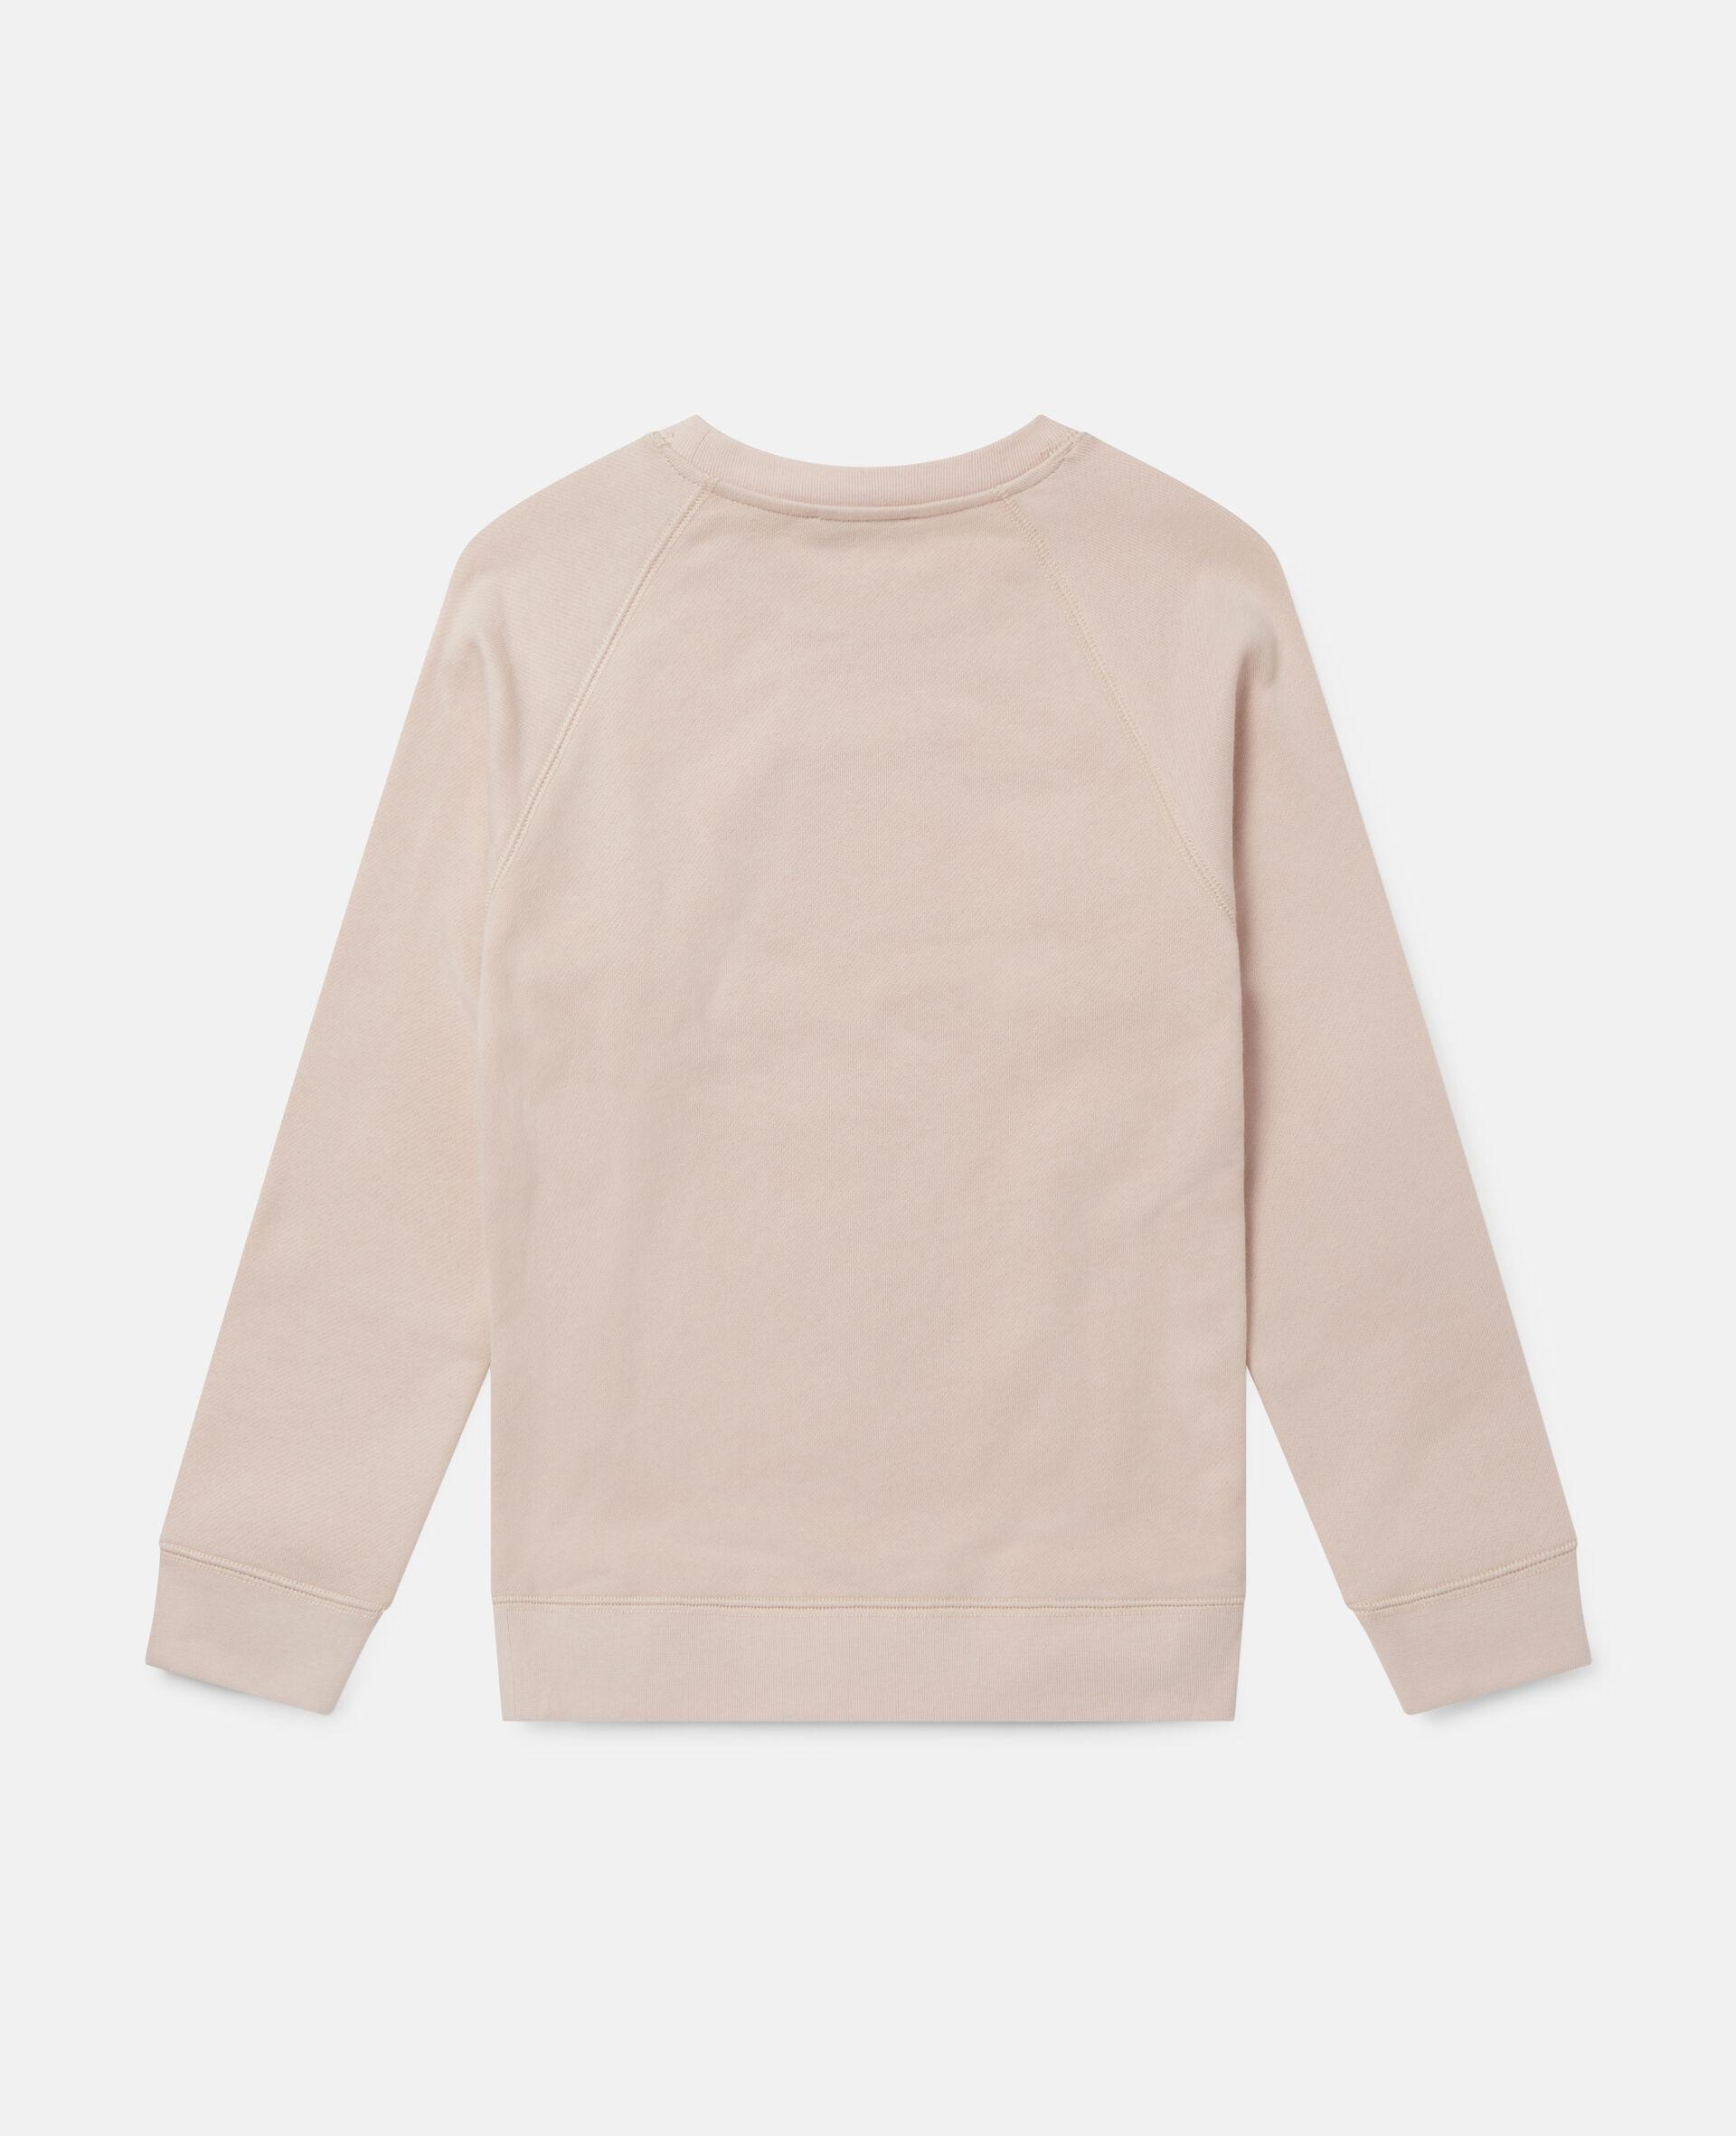 Skating Poodle Fleece Sweatshirt-Pink-large image number 3